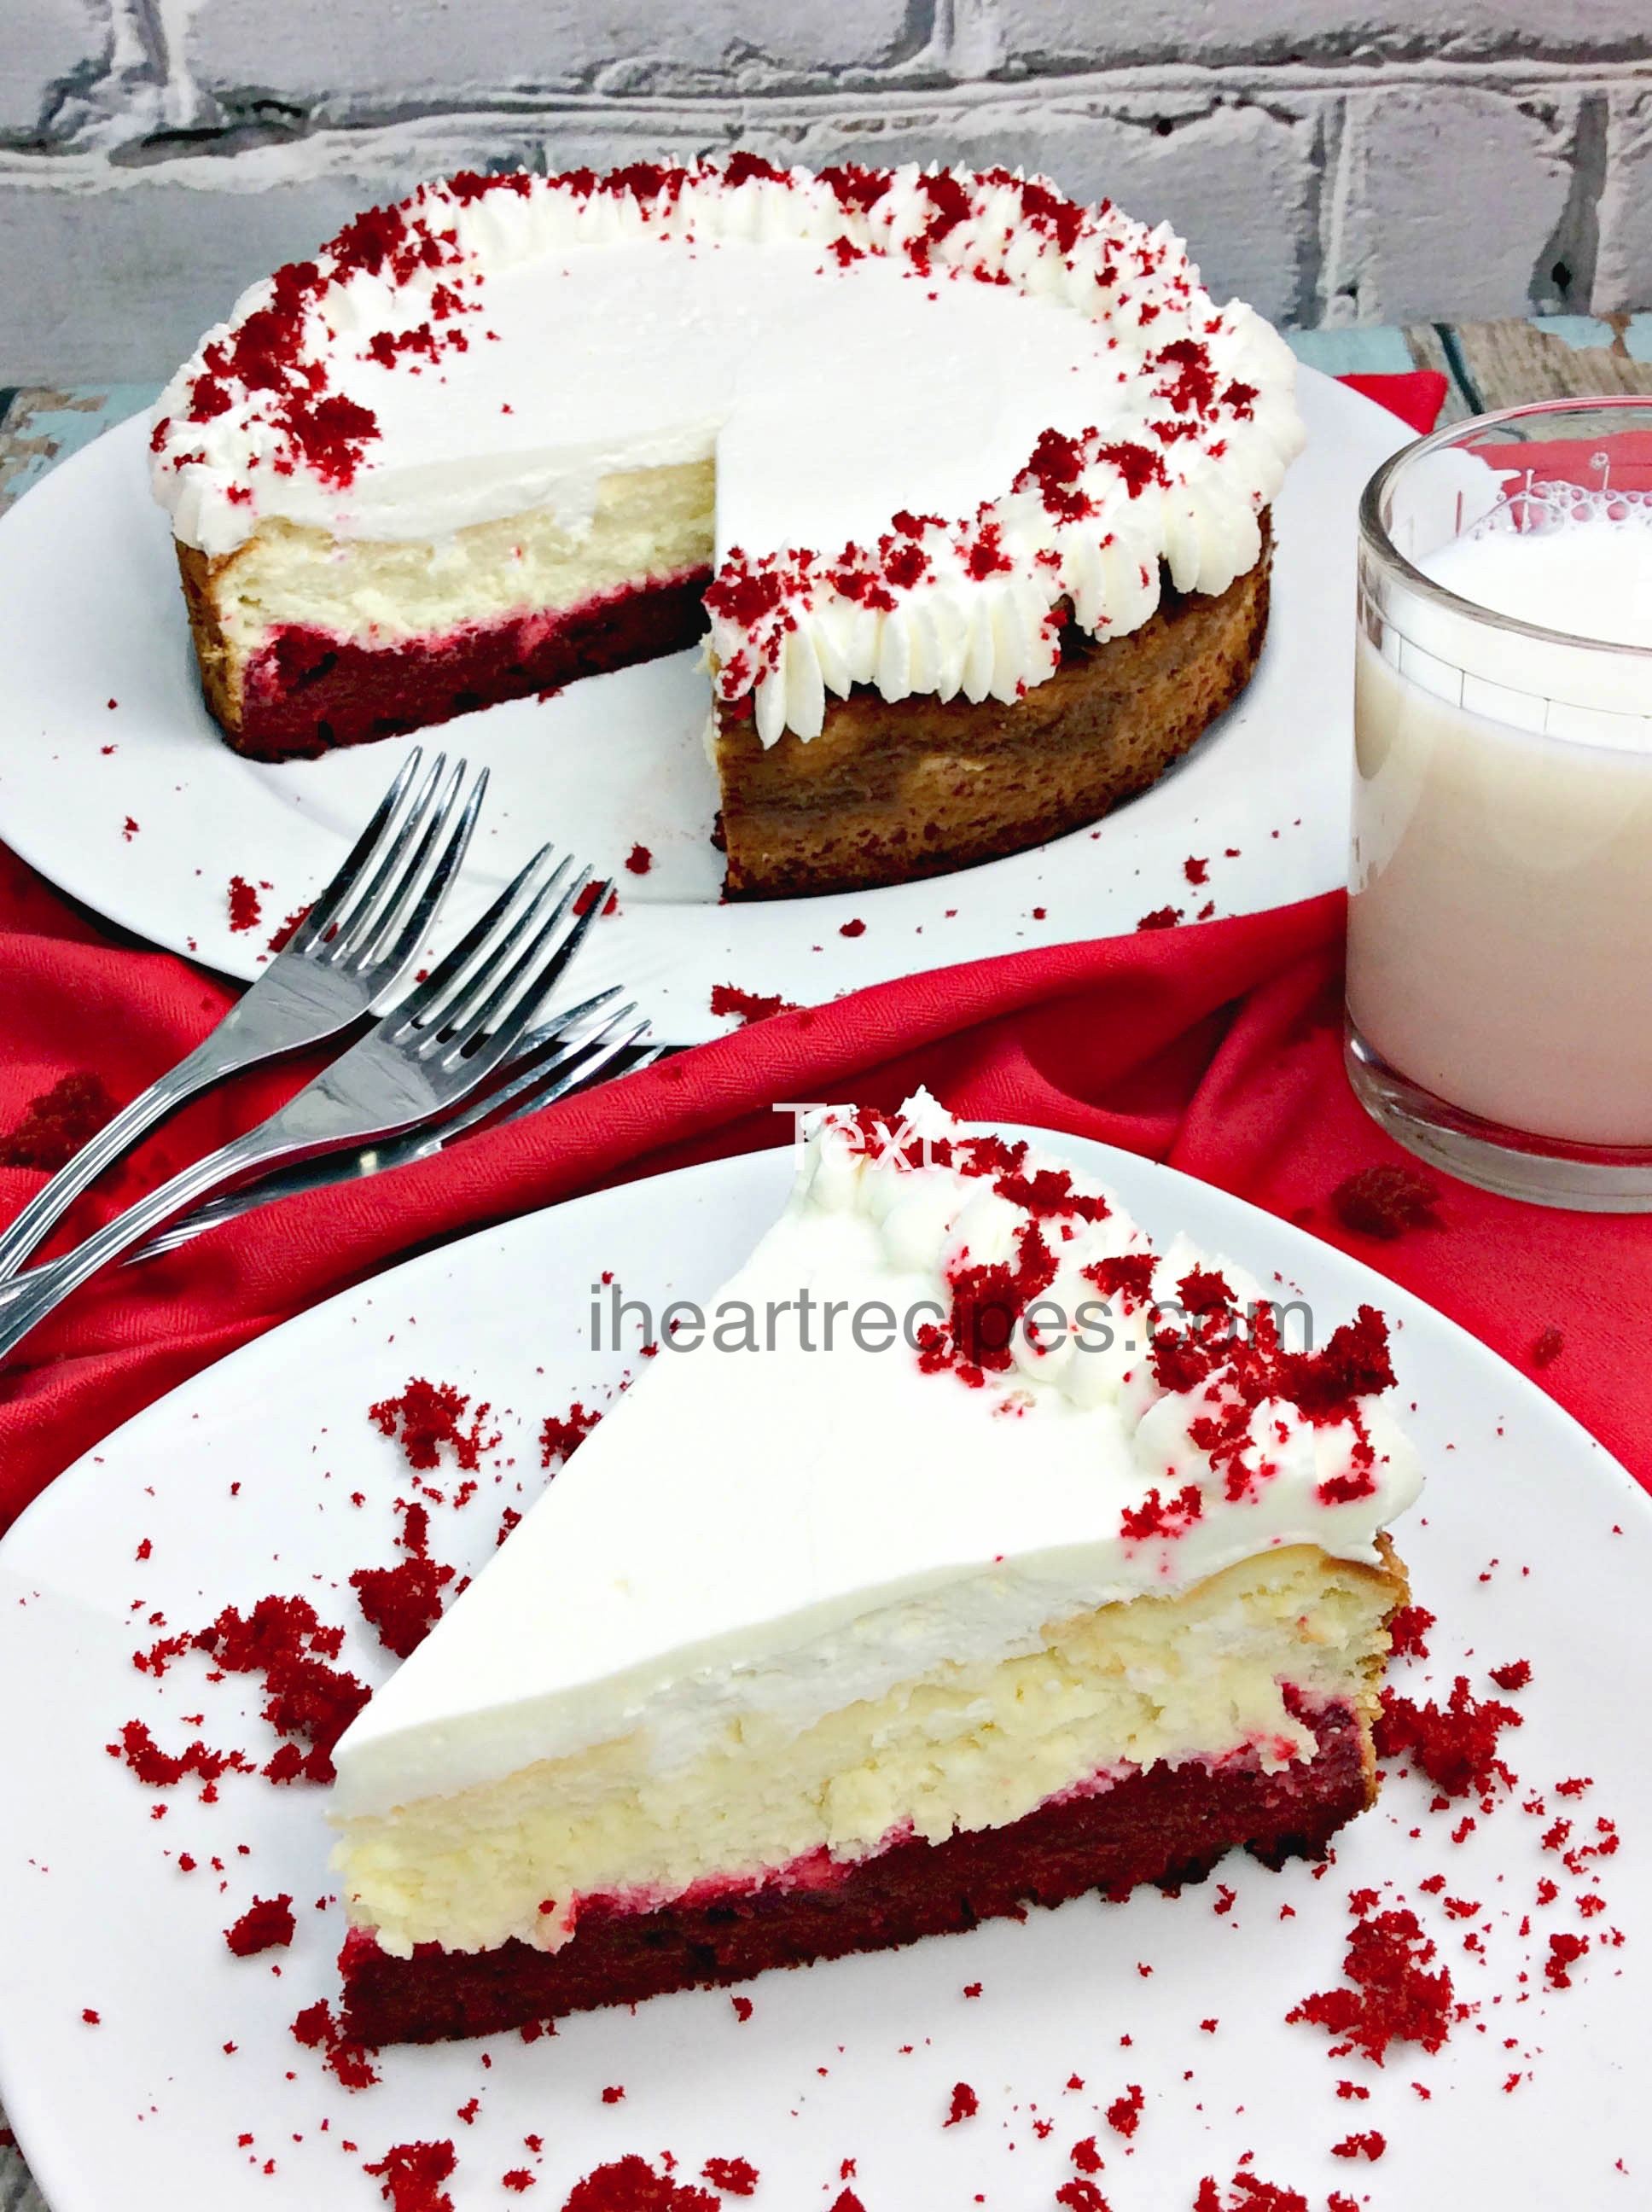 Red Velvet Cheesecake Recipe | I Heart Recipes